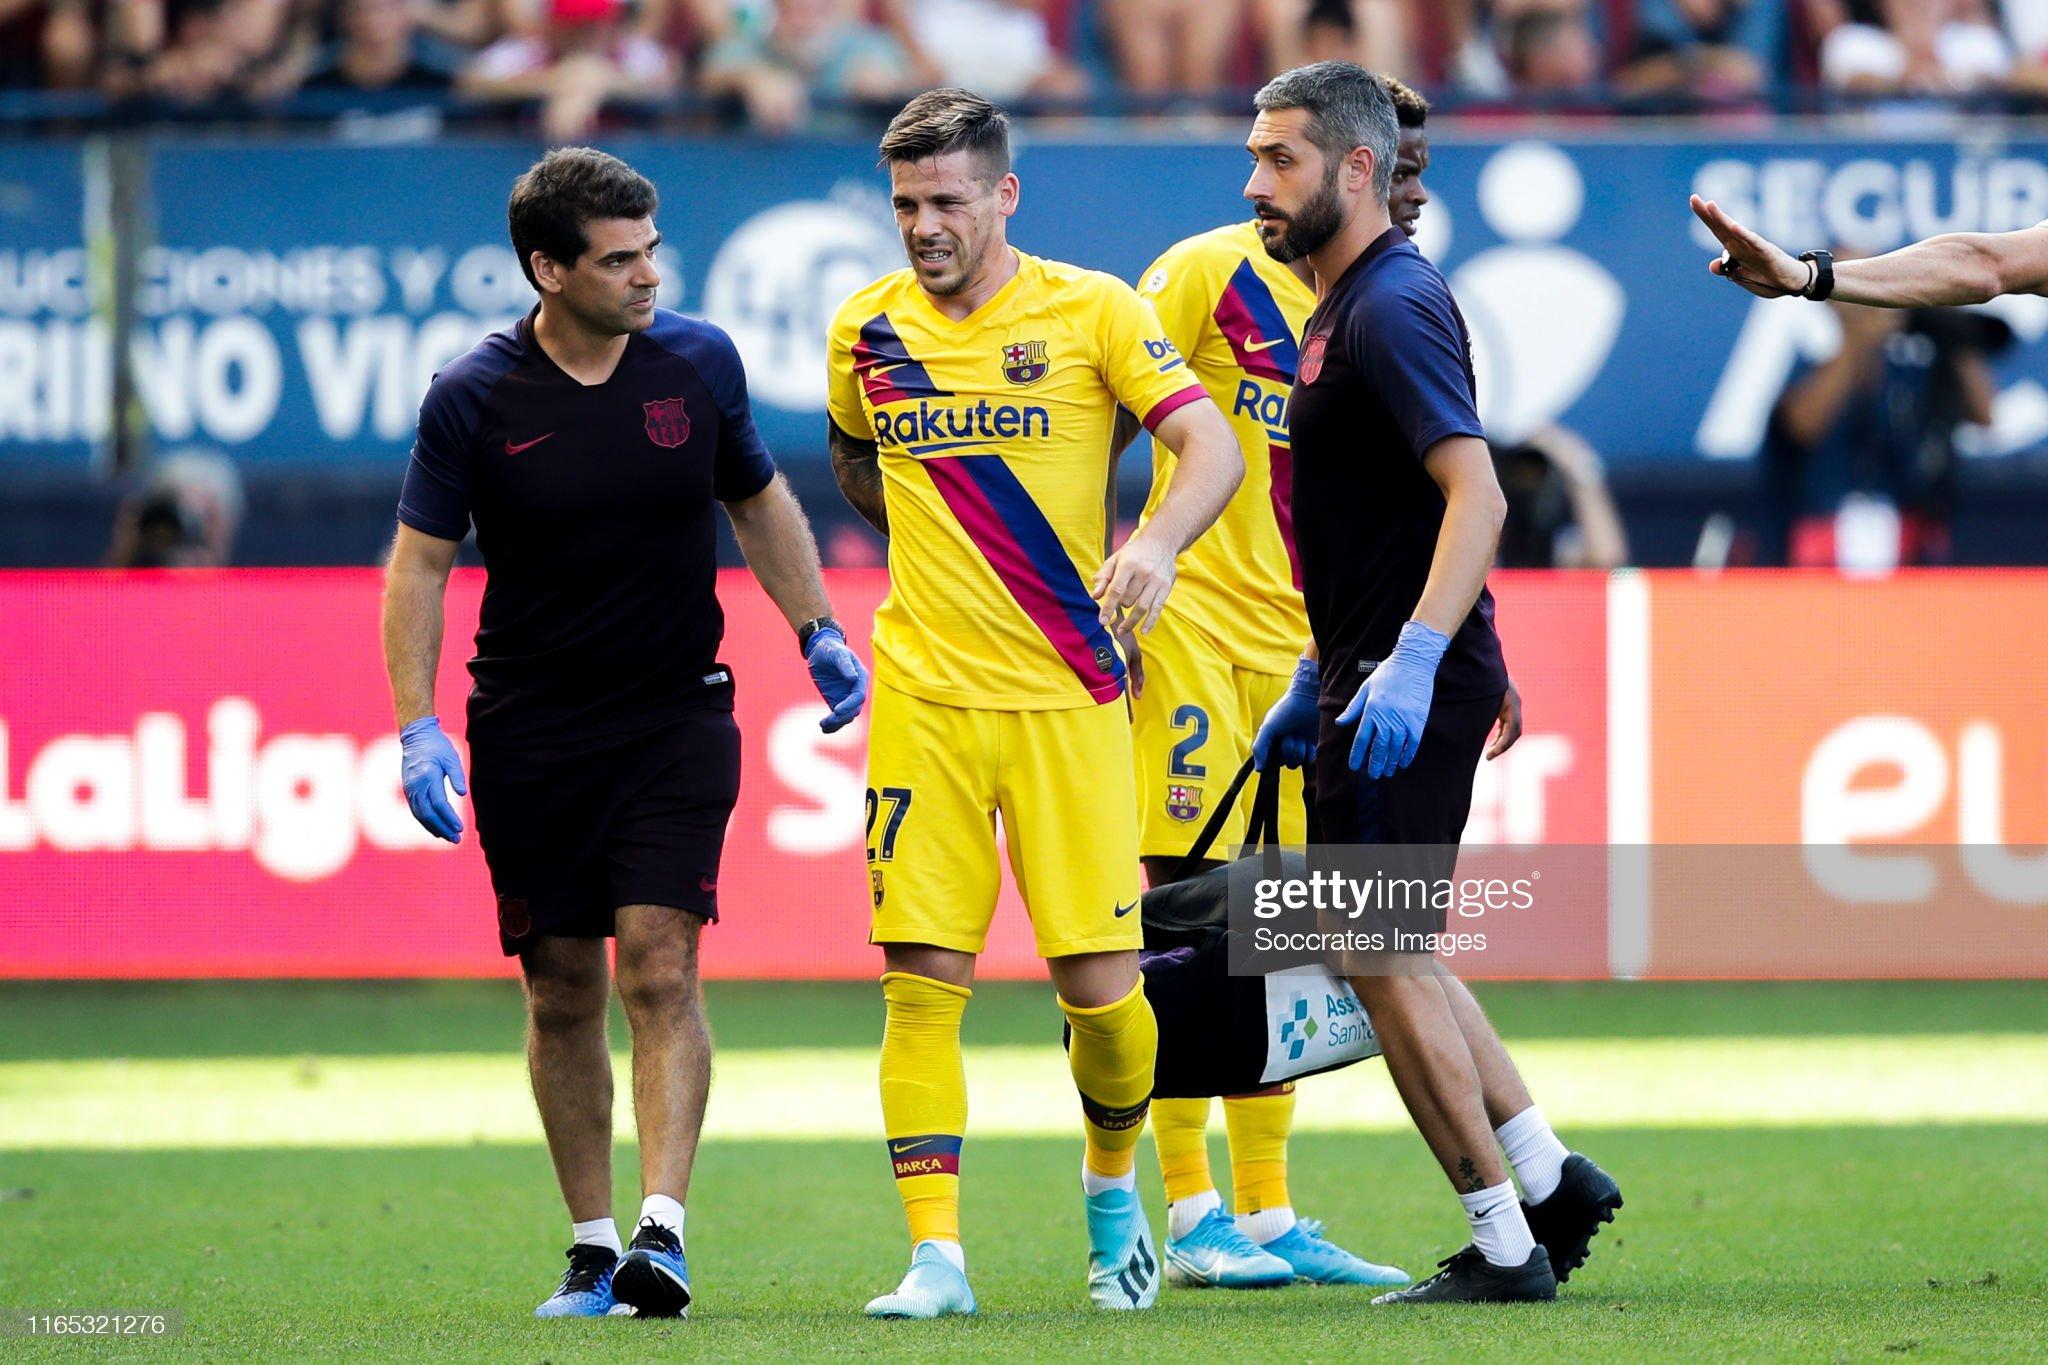 صور مباراة : أوساسونا - برشلونة 2-2 ( 31-08-2019 )  Carles-perez-of-fc-barcelona-during-the-la-liga-santander-match-v-picture-id1165321276?s=2048x2048